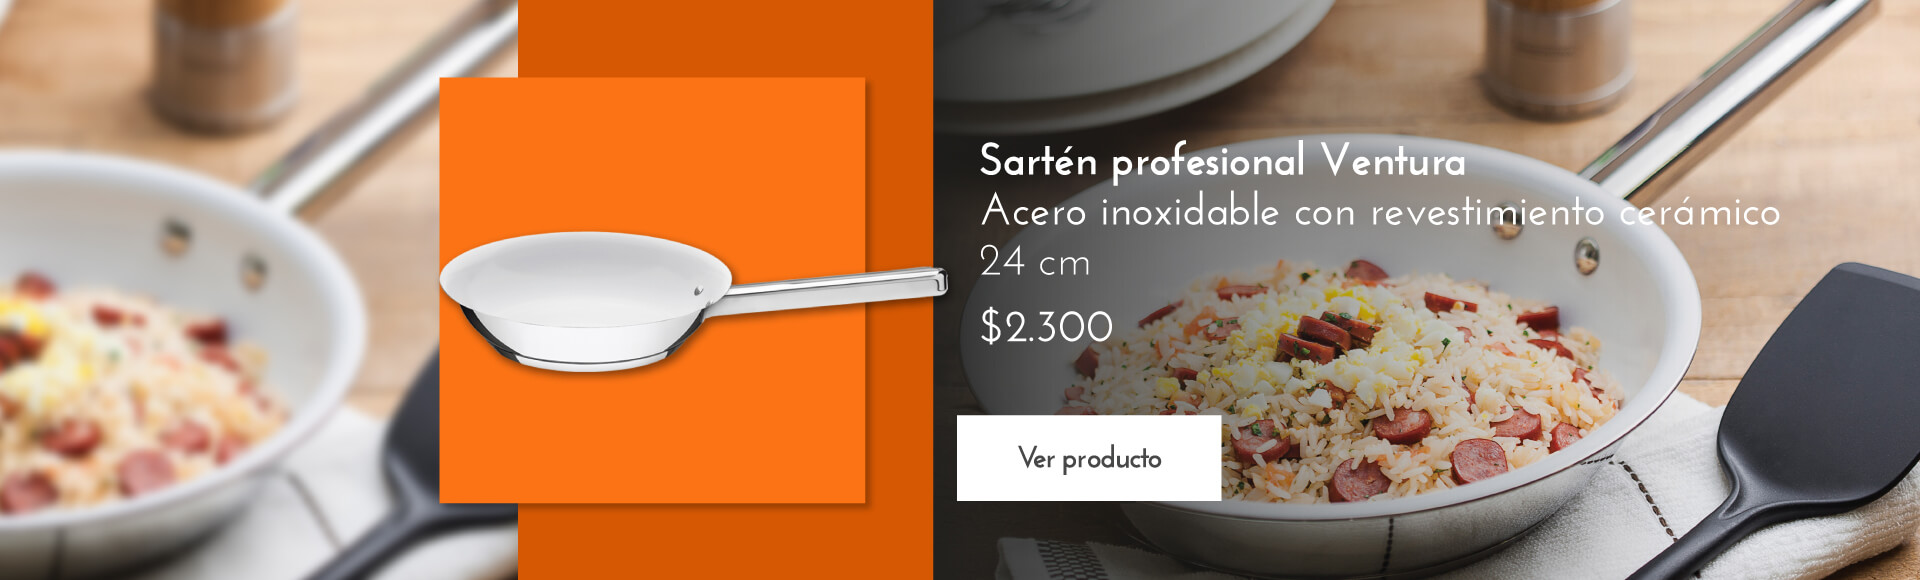 Sarten_Ventura 24cms